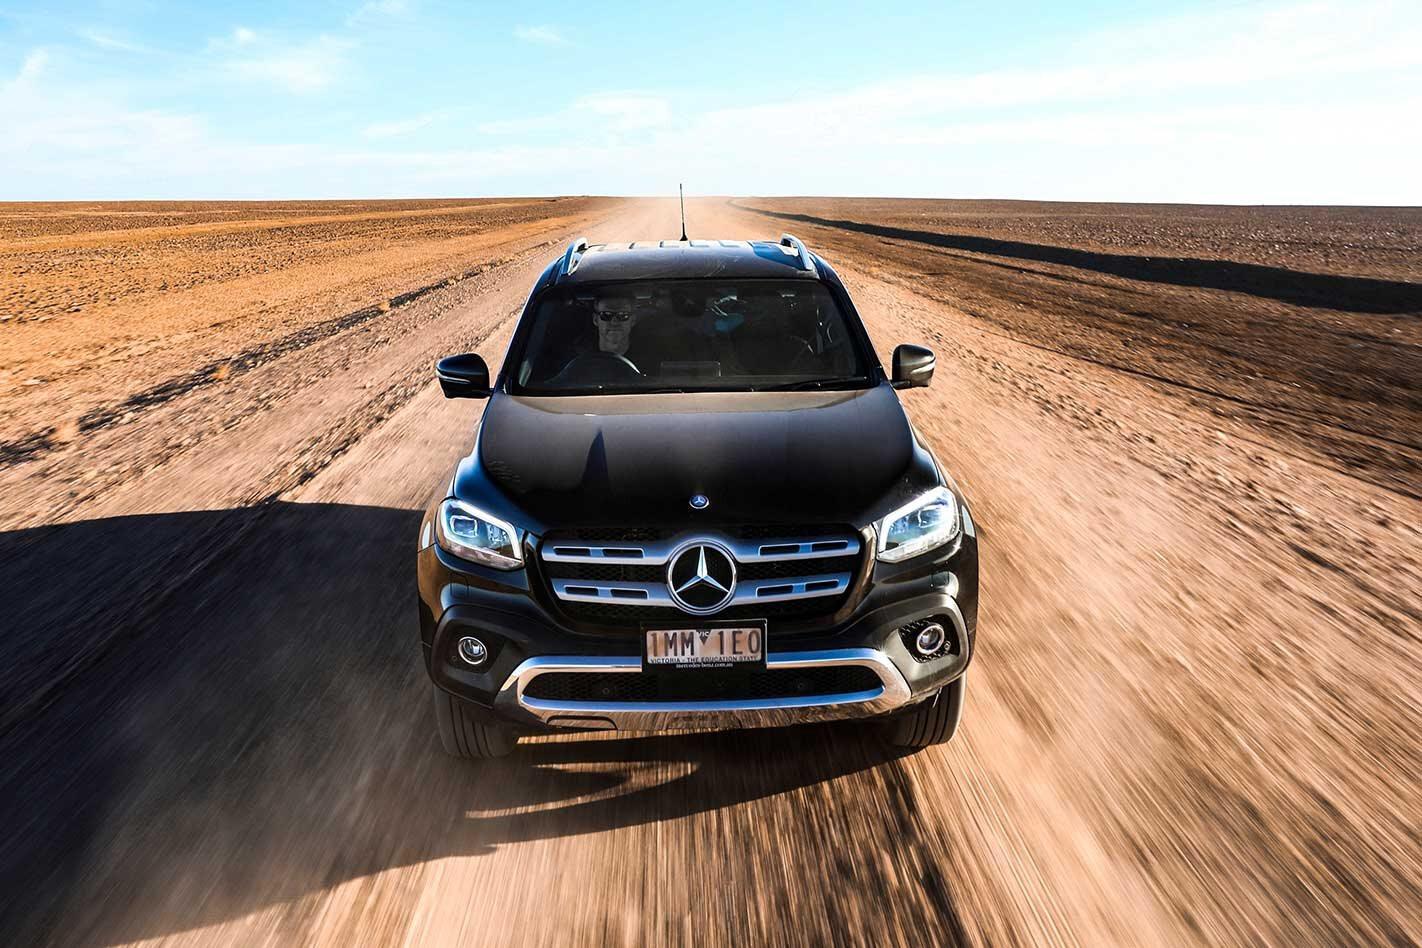 2018 Mercedes-Benz X250d 4x4 review